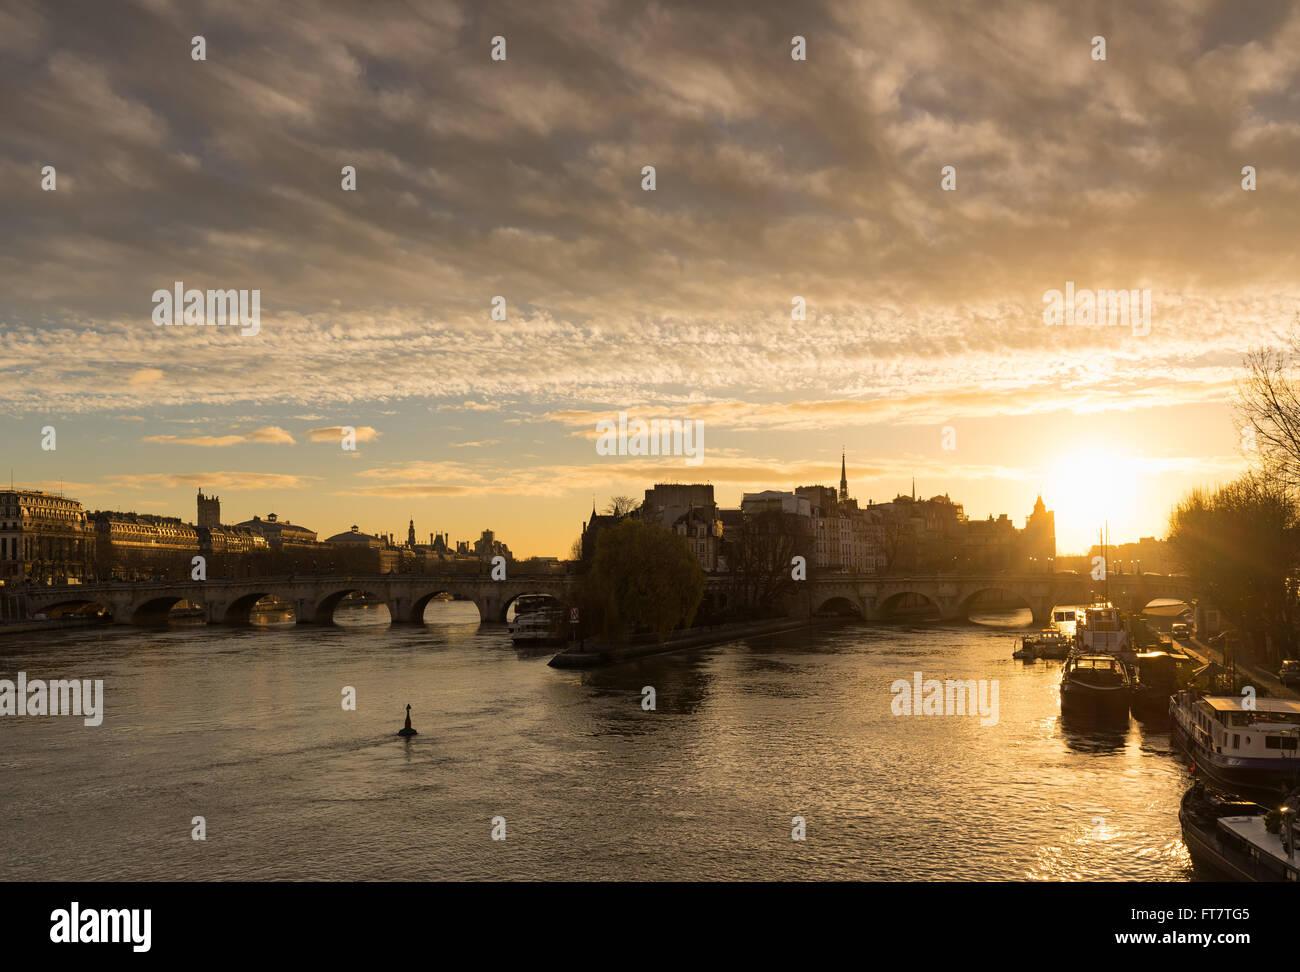 Winter sunrise on the Ile de La Cite, Pont Neuf and the Seine River in the 1st Arrondissement of Paris, France - Stock Image